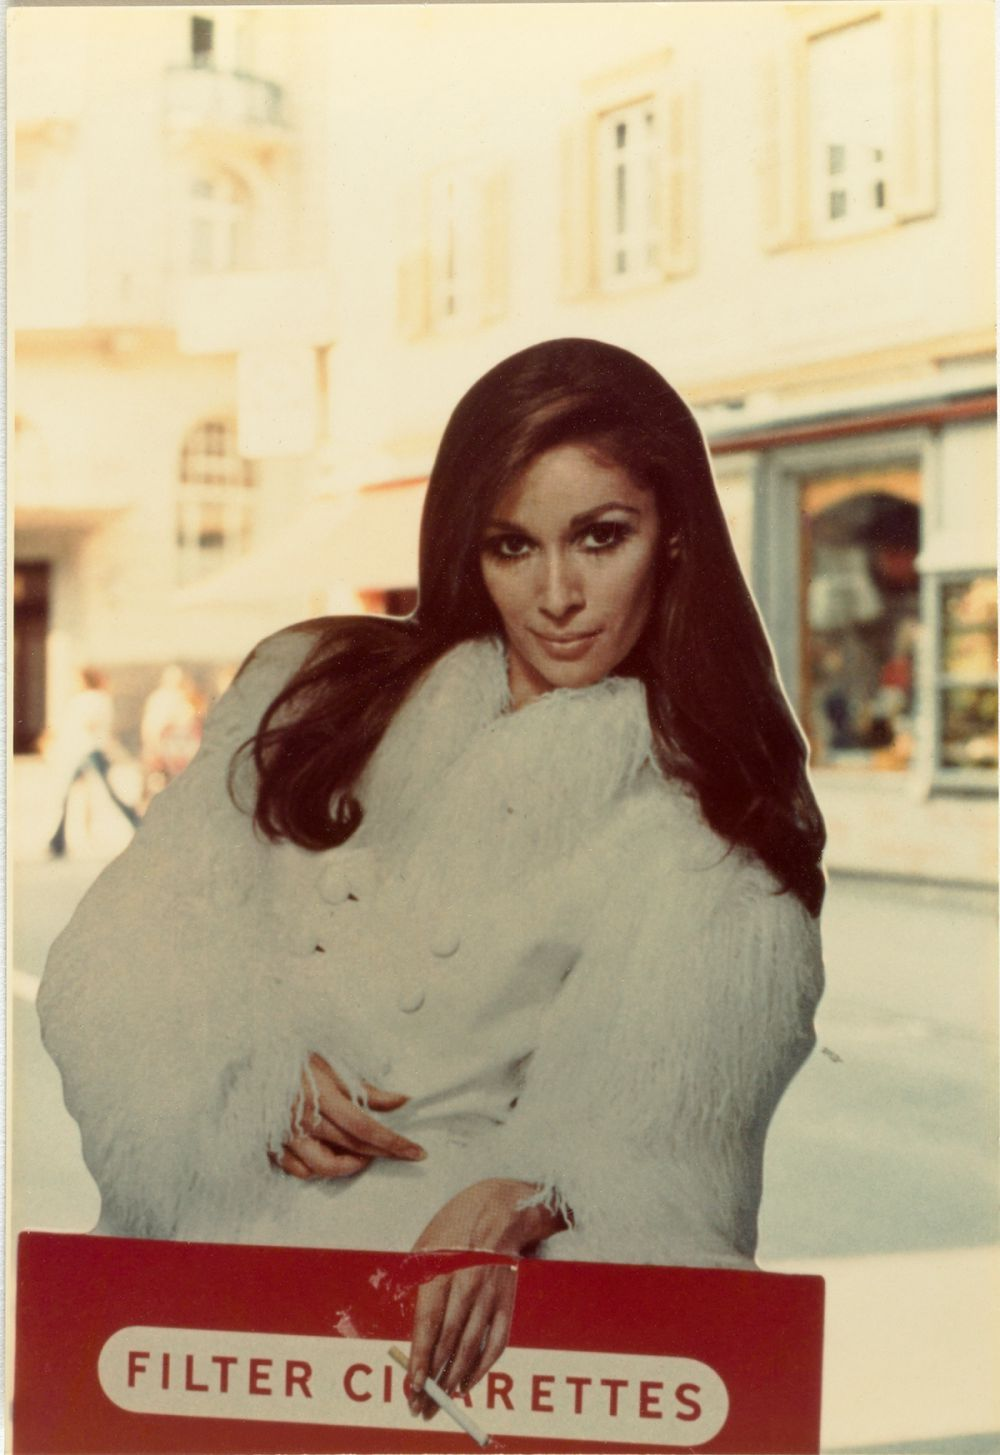 (Luzern), 1971